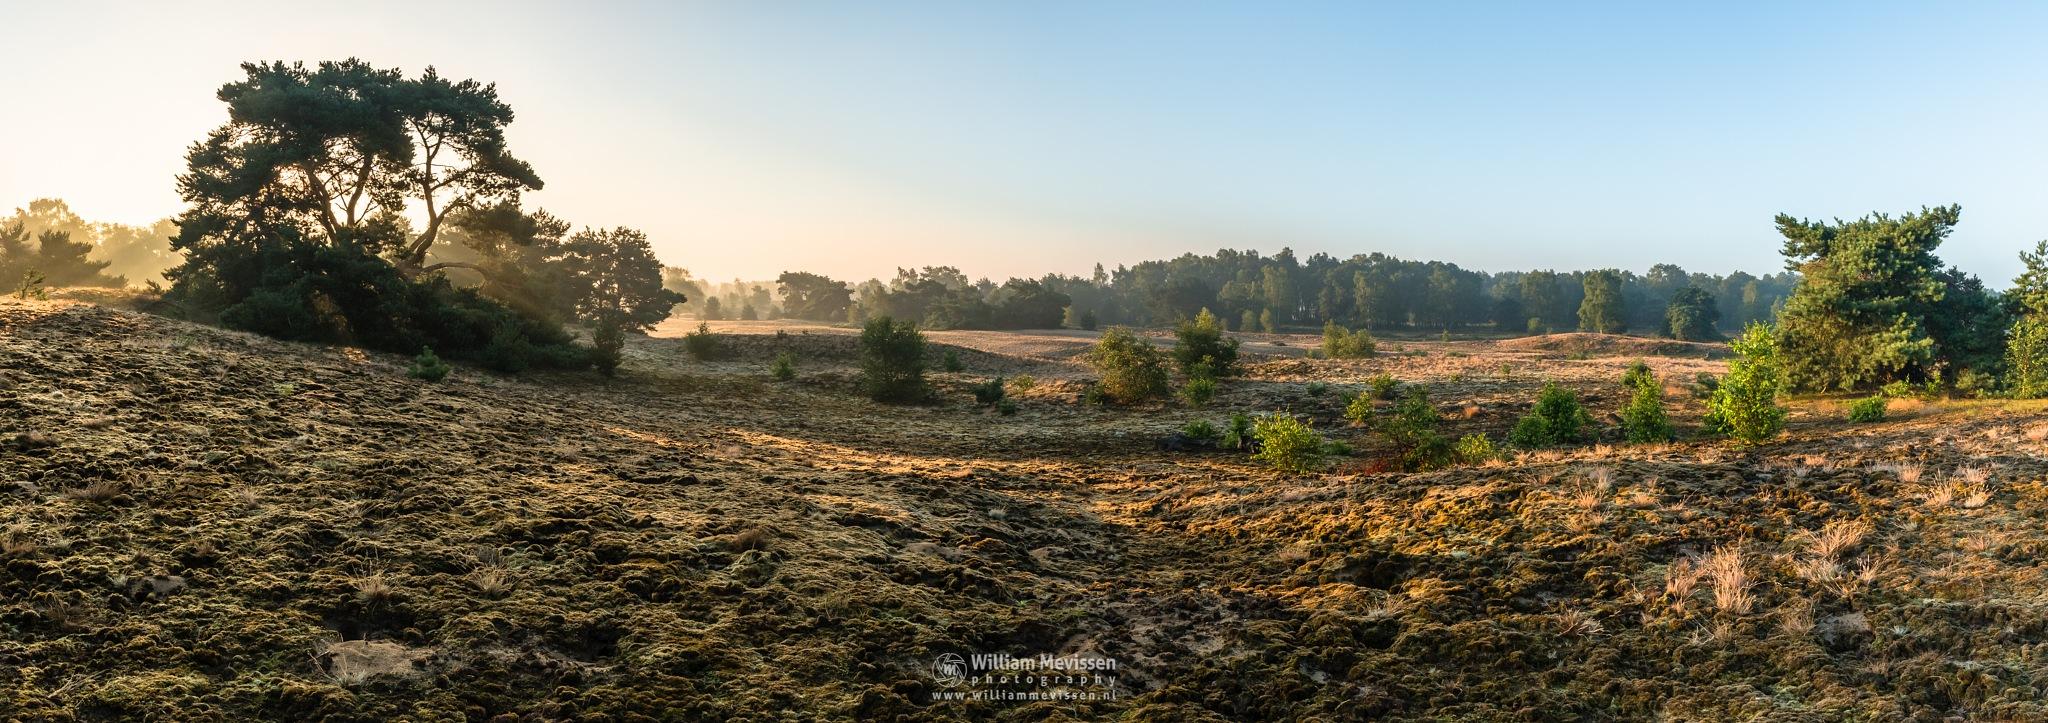 Panorama - Sunrise Bergerheide by William Mevissen